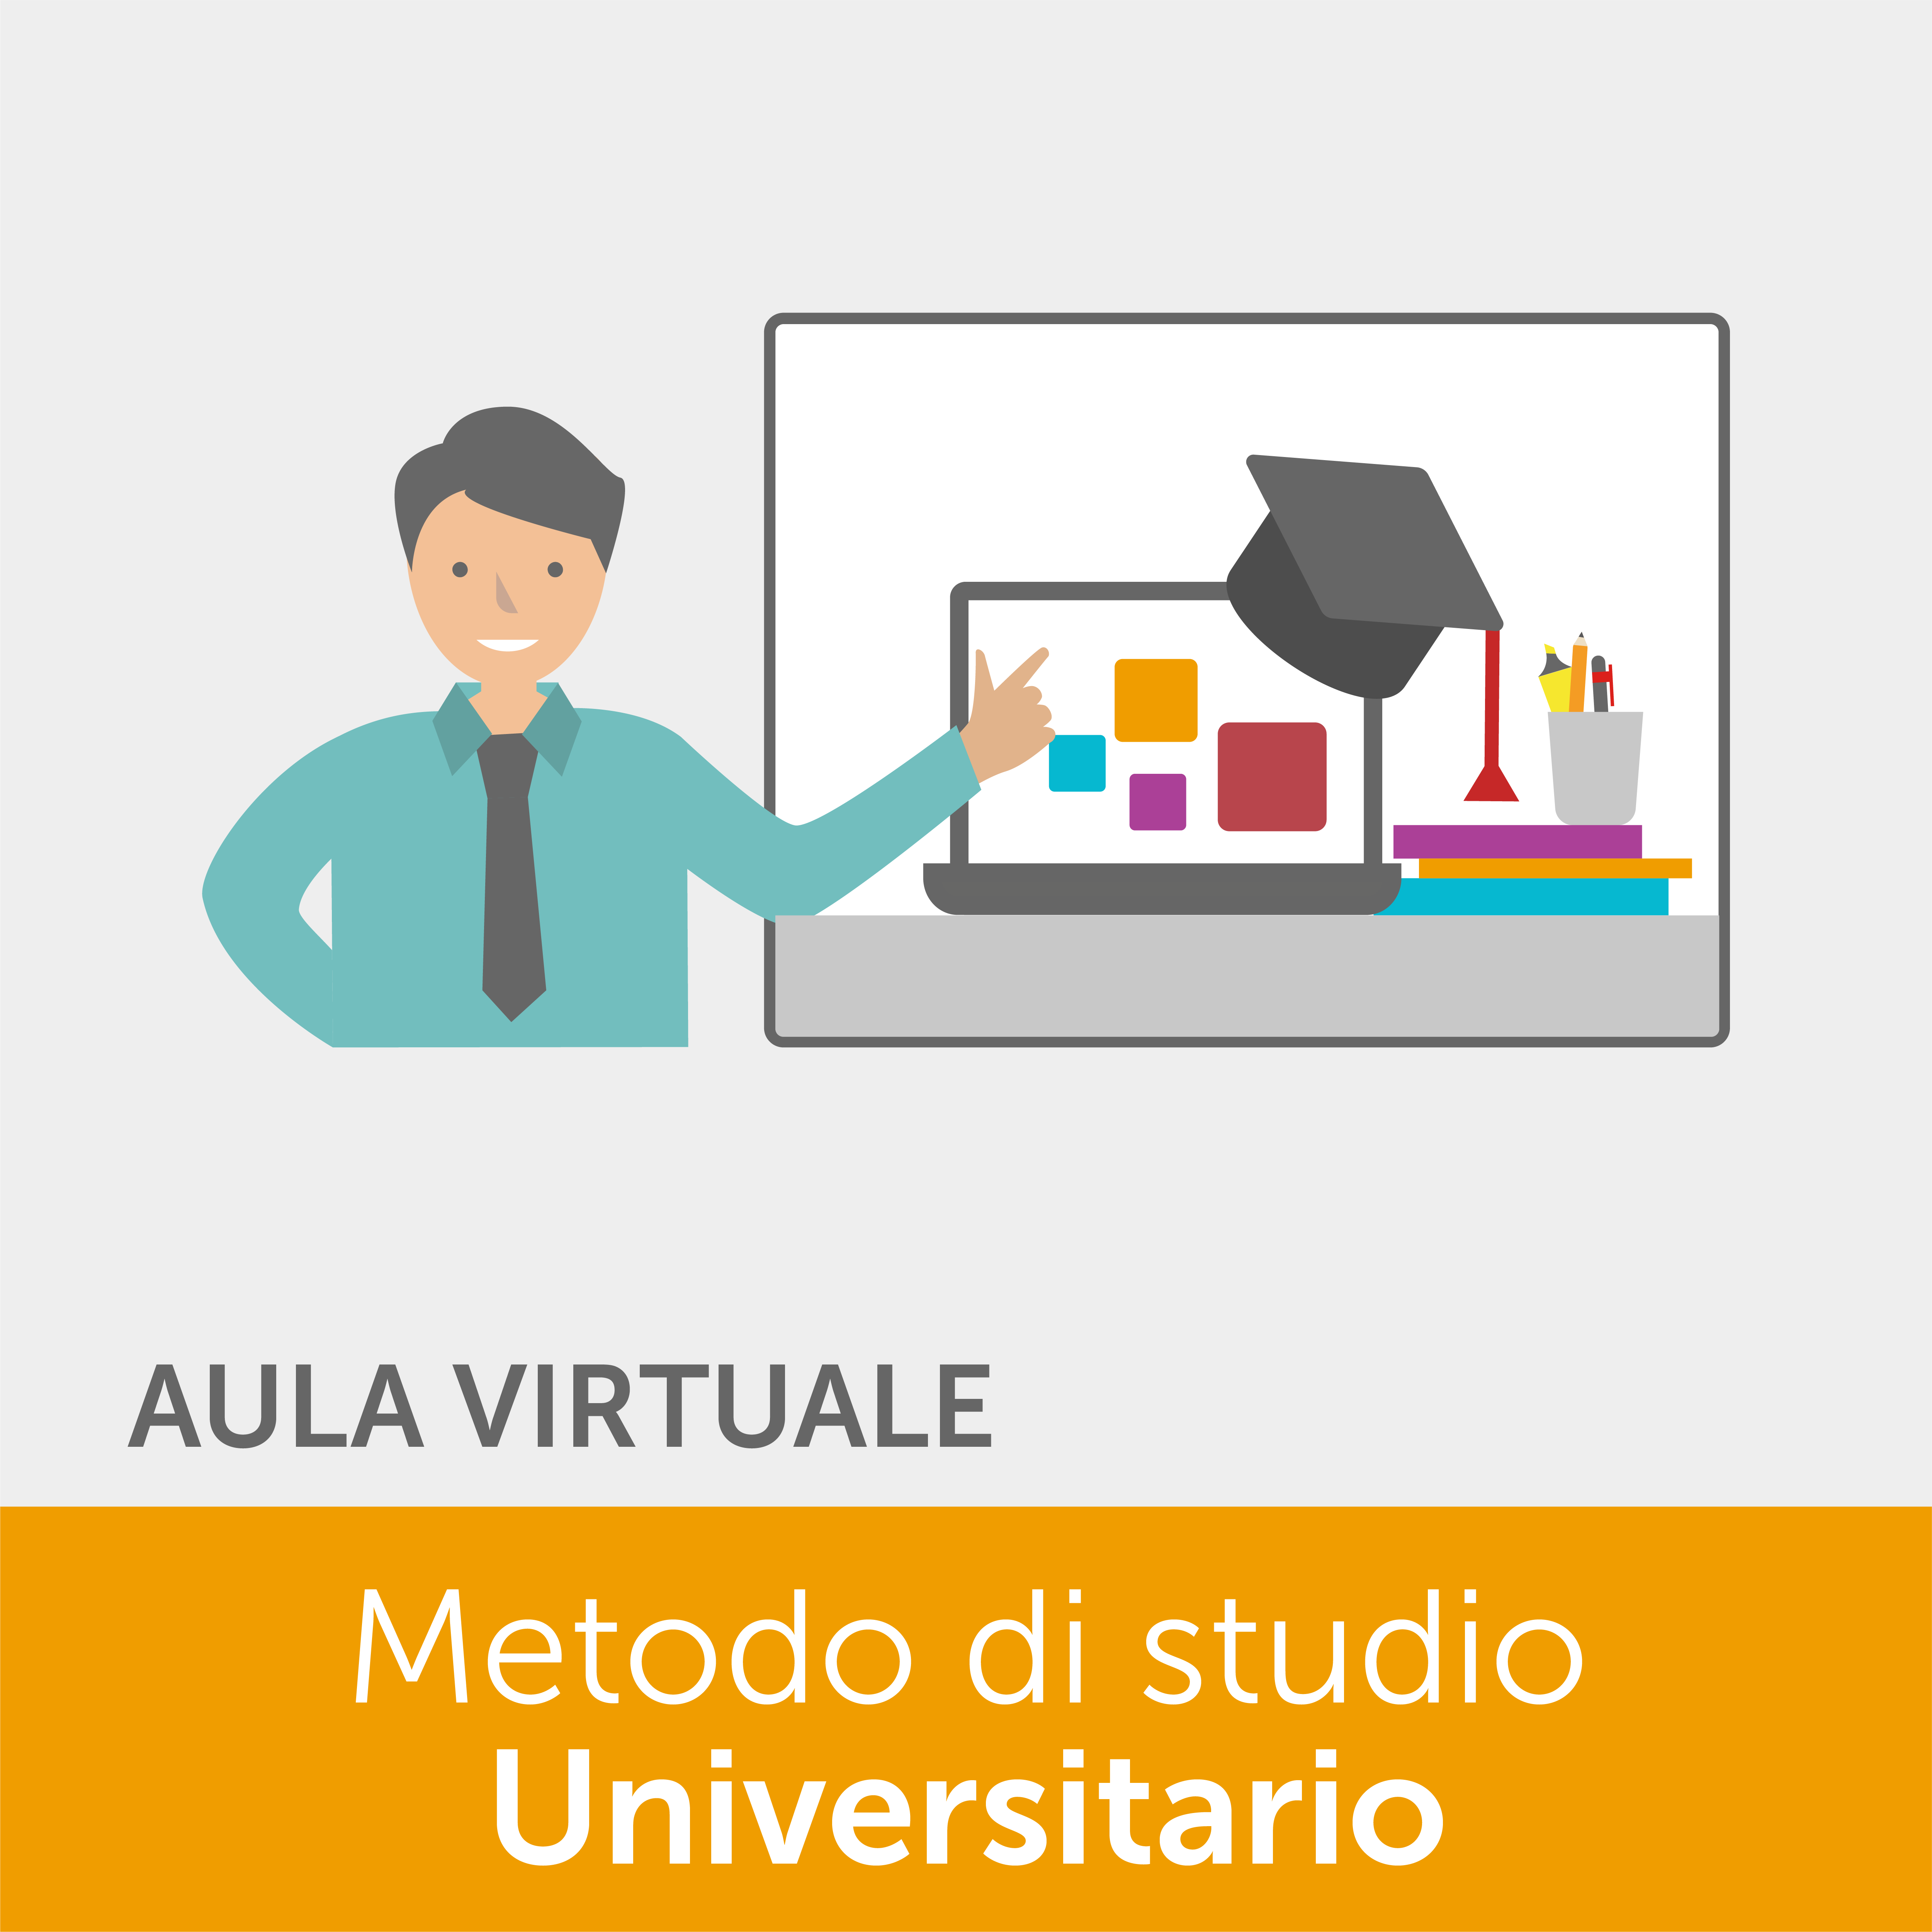 Metodo di studio universitario efficace - Ed. online